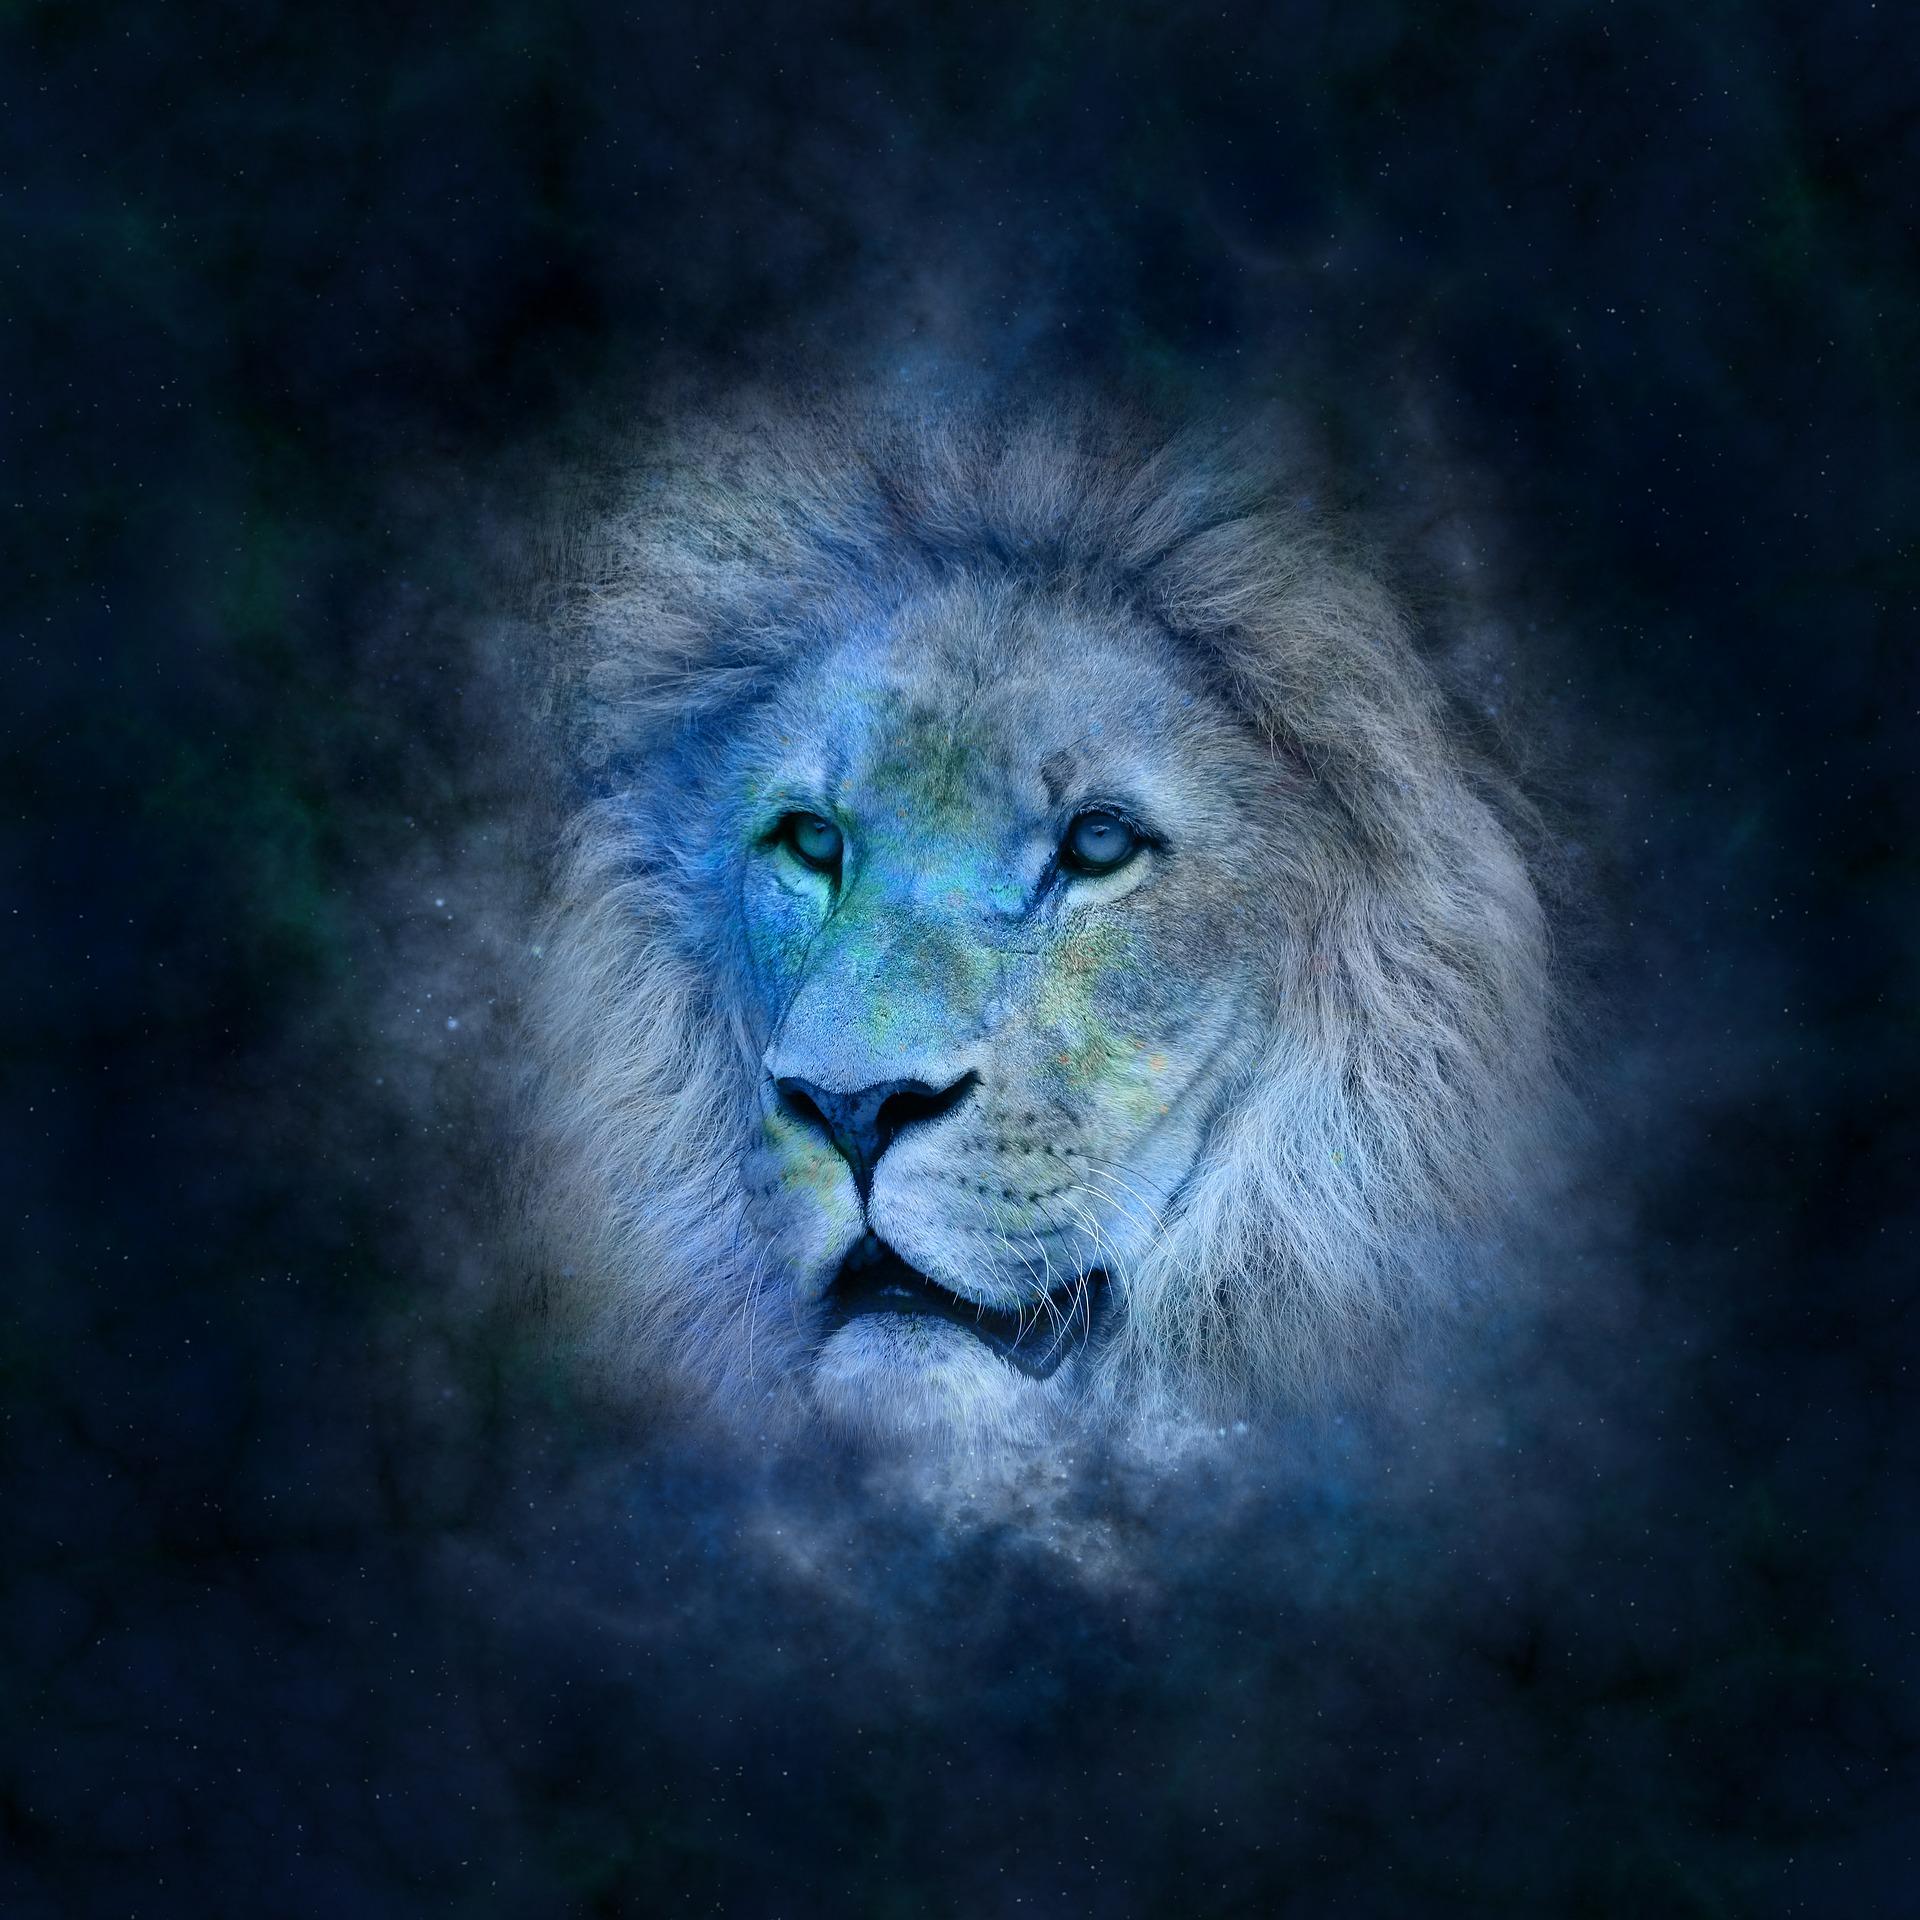 Horoscop săptămânal Minerva 7-13 septembrie 2020 - Leu